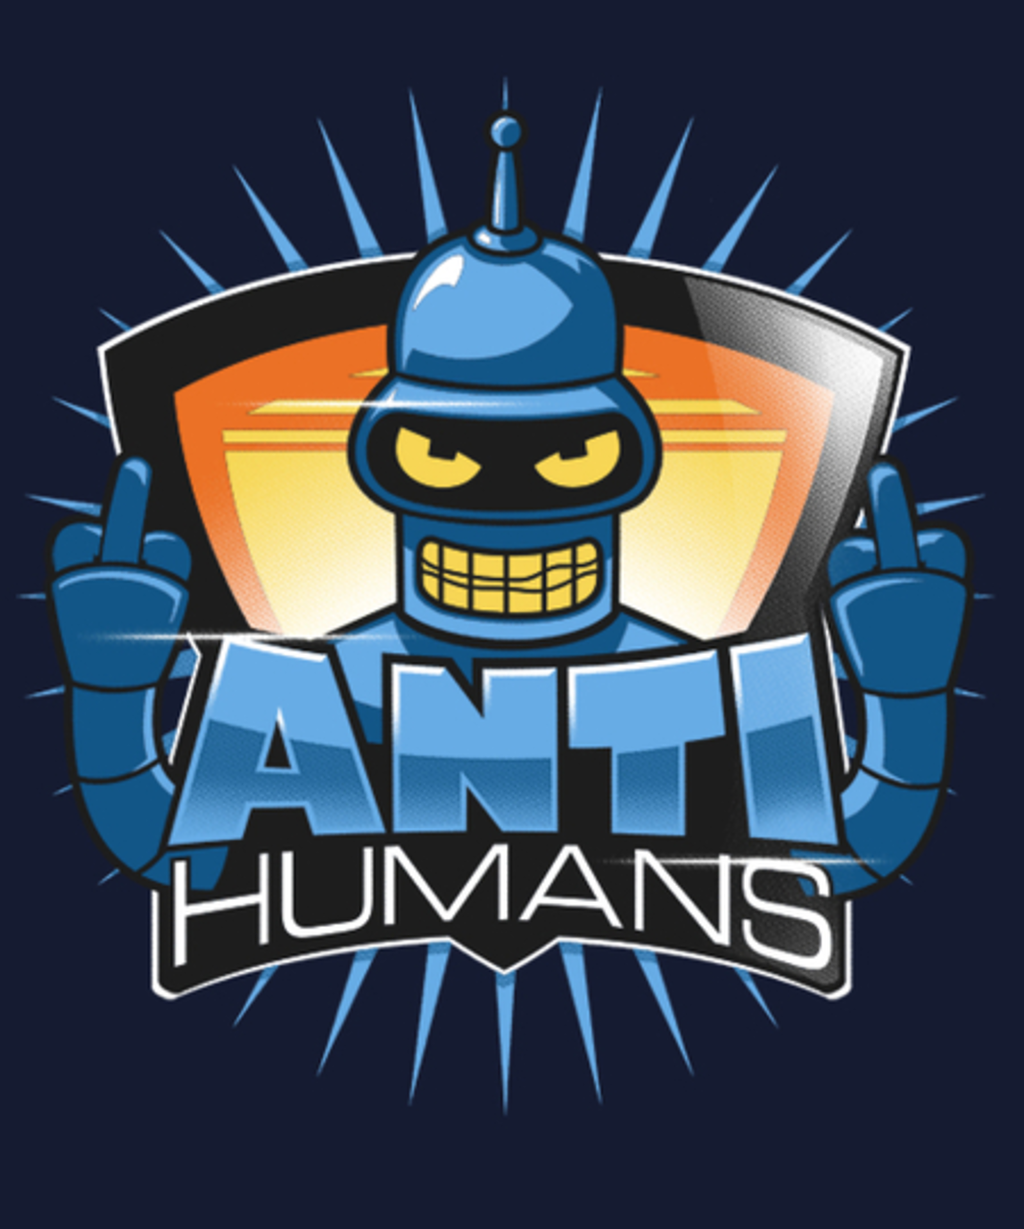 Qwertee: RudeBot Anti-Humans